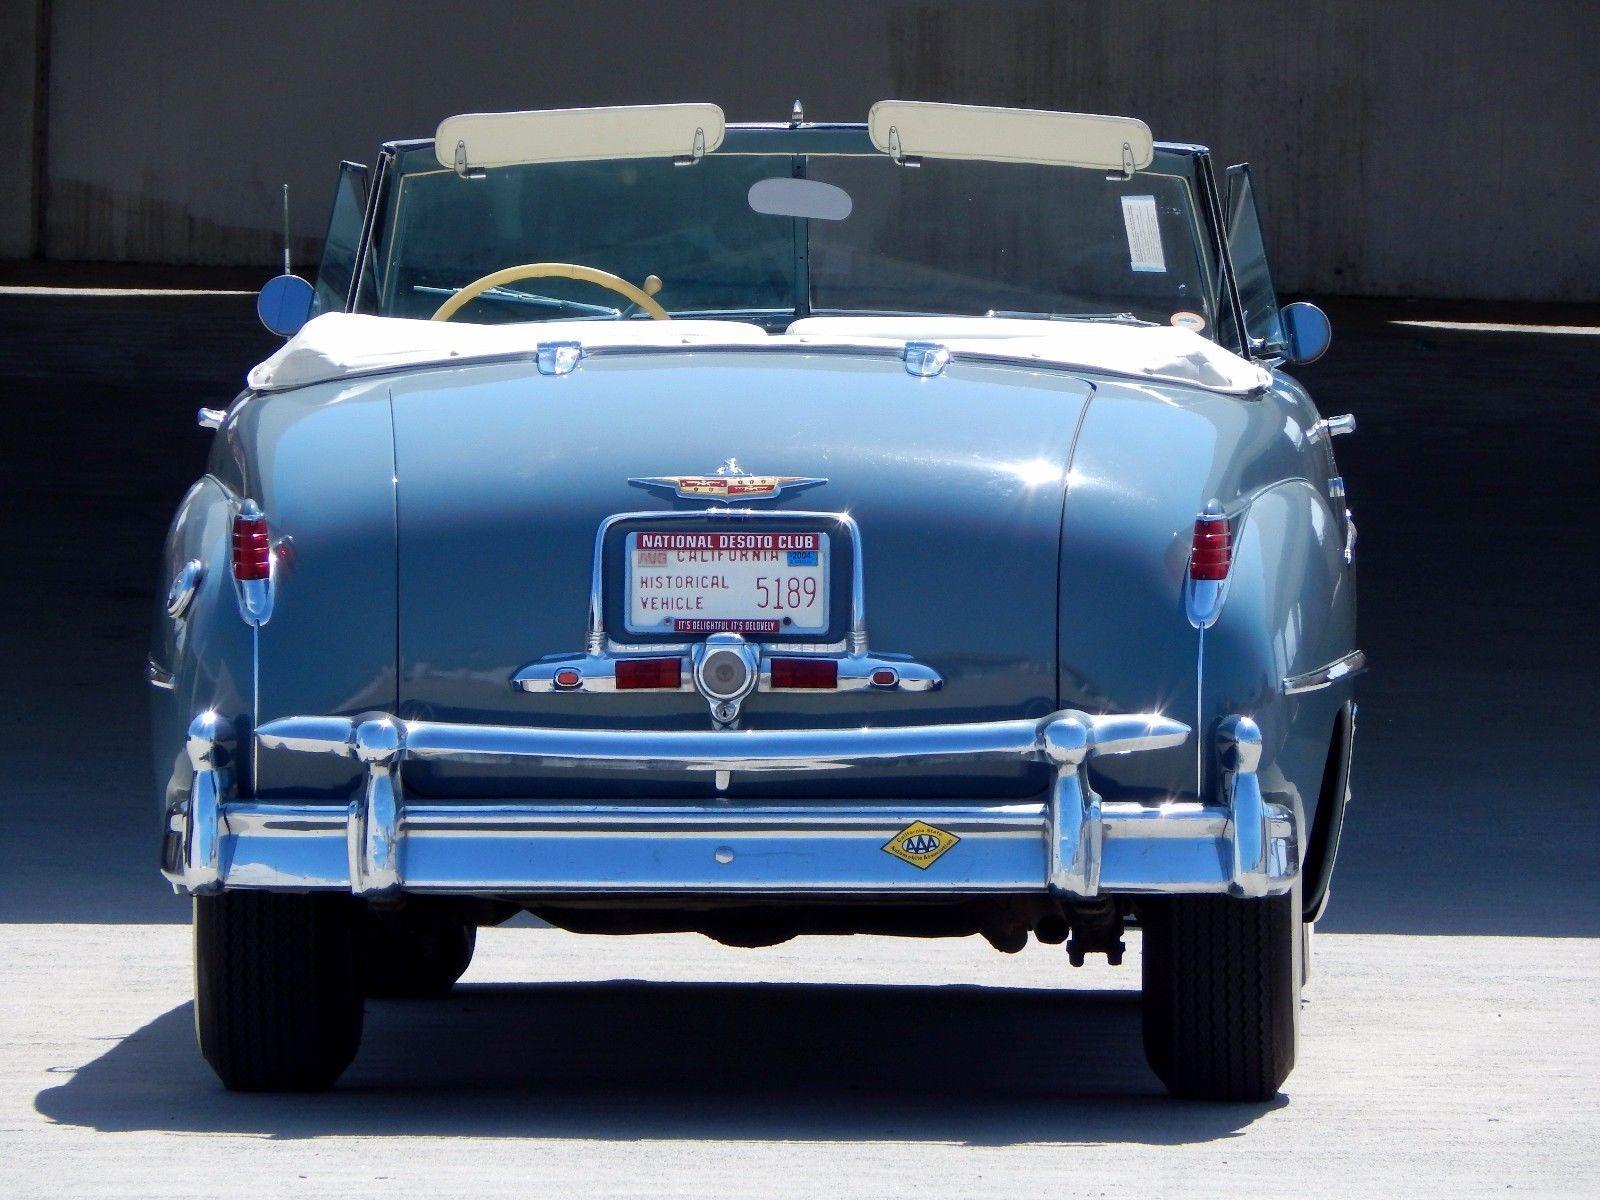 1956 desoto firedome seville 4 door hardtop 1 of 10 - 1936 Desoto Airstream Custom 4 Door Convertible Sedan Sedans Convertible And Motor Car